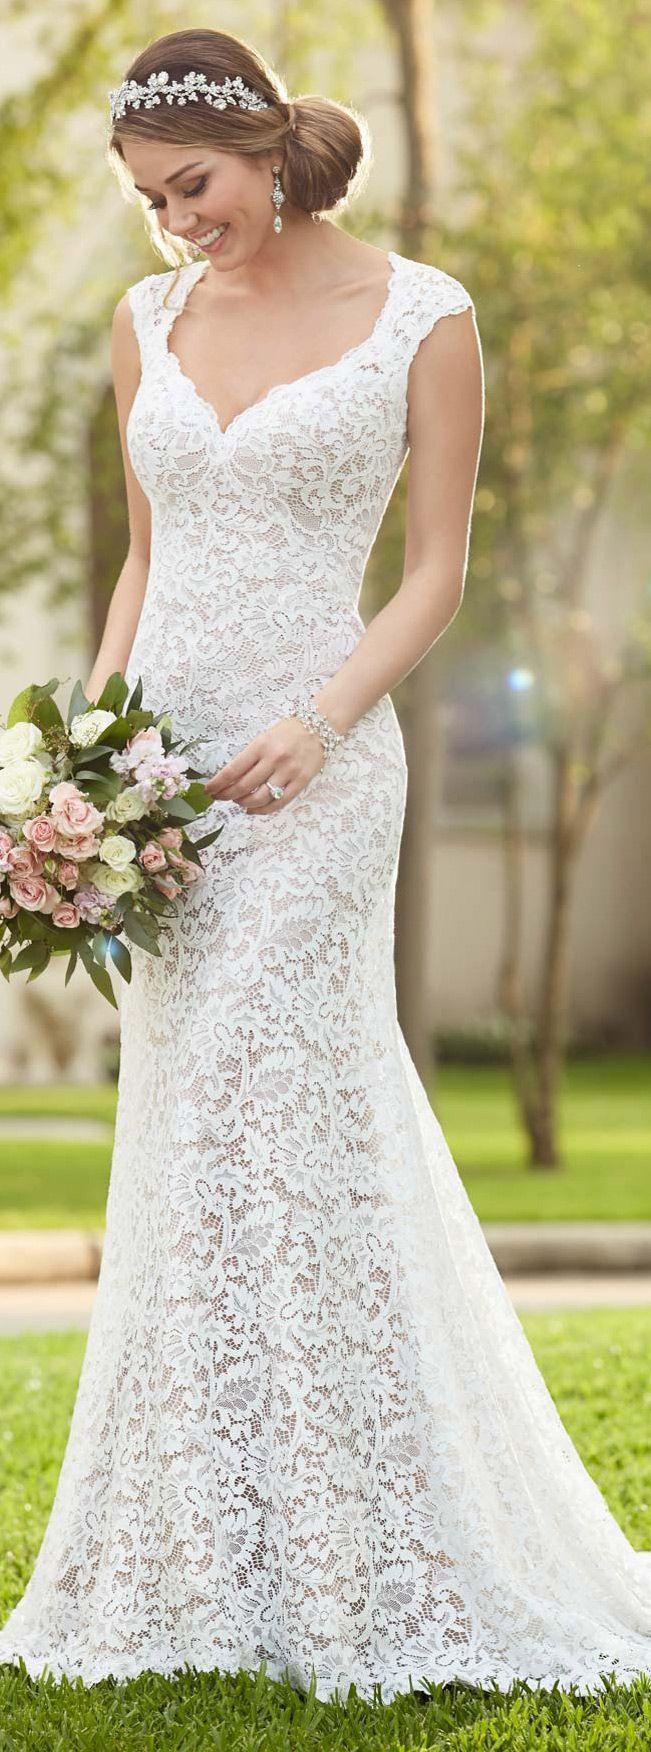 Stella York full lace long wedding dress #vestidodenovia | # trajesdenovio | vestidos de novia para gorditas | vestidos de novia cortos http://amzn.to/29aGZWo